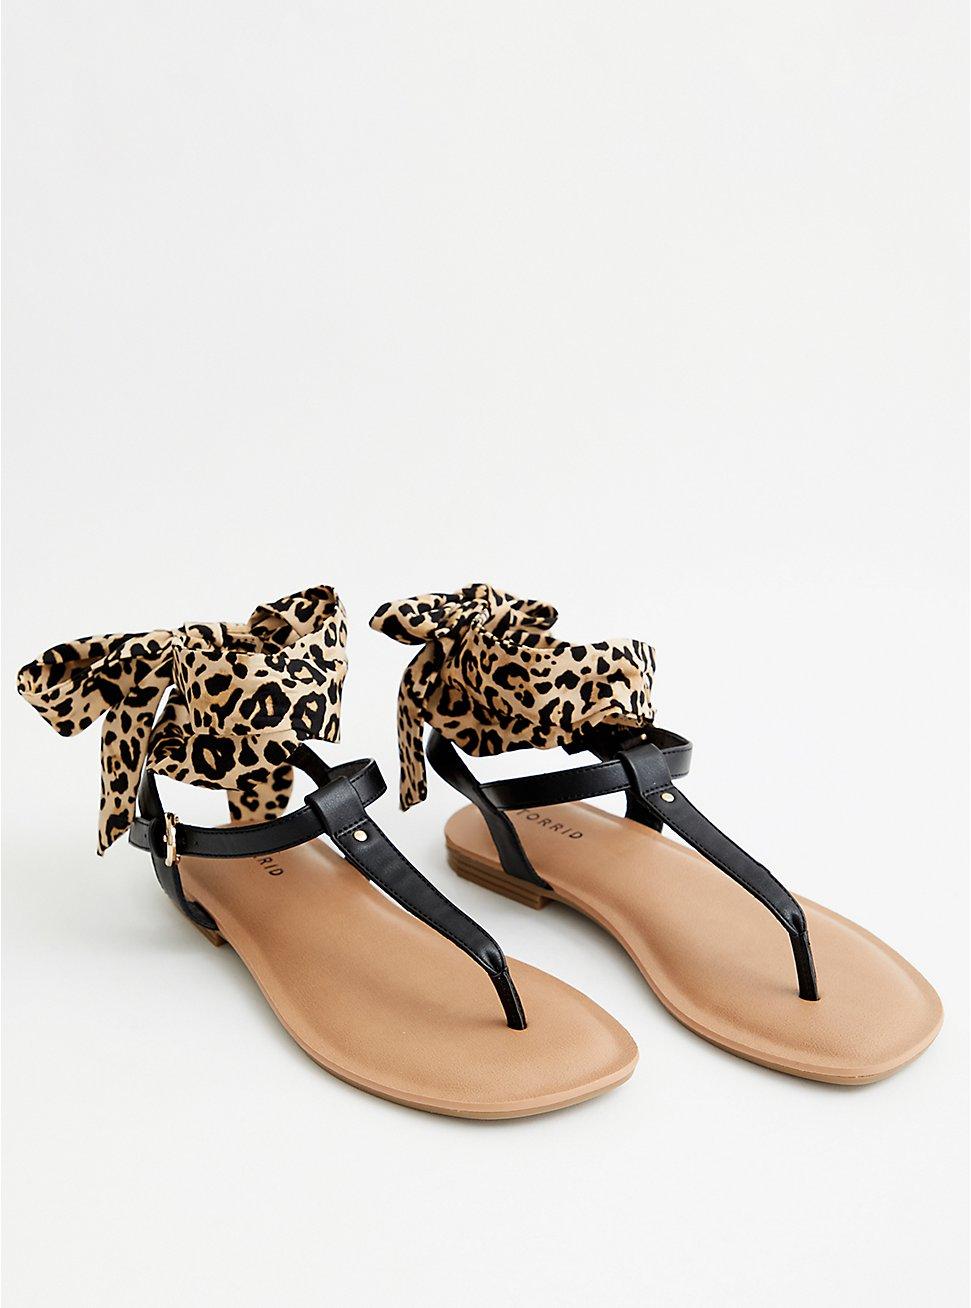 Black Faux Leather Sandal With Ankle Wrap, BLACK, hi-res